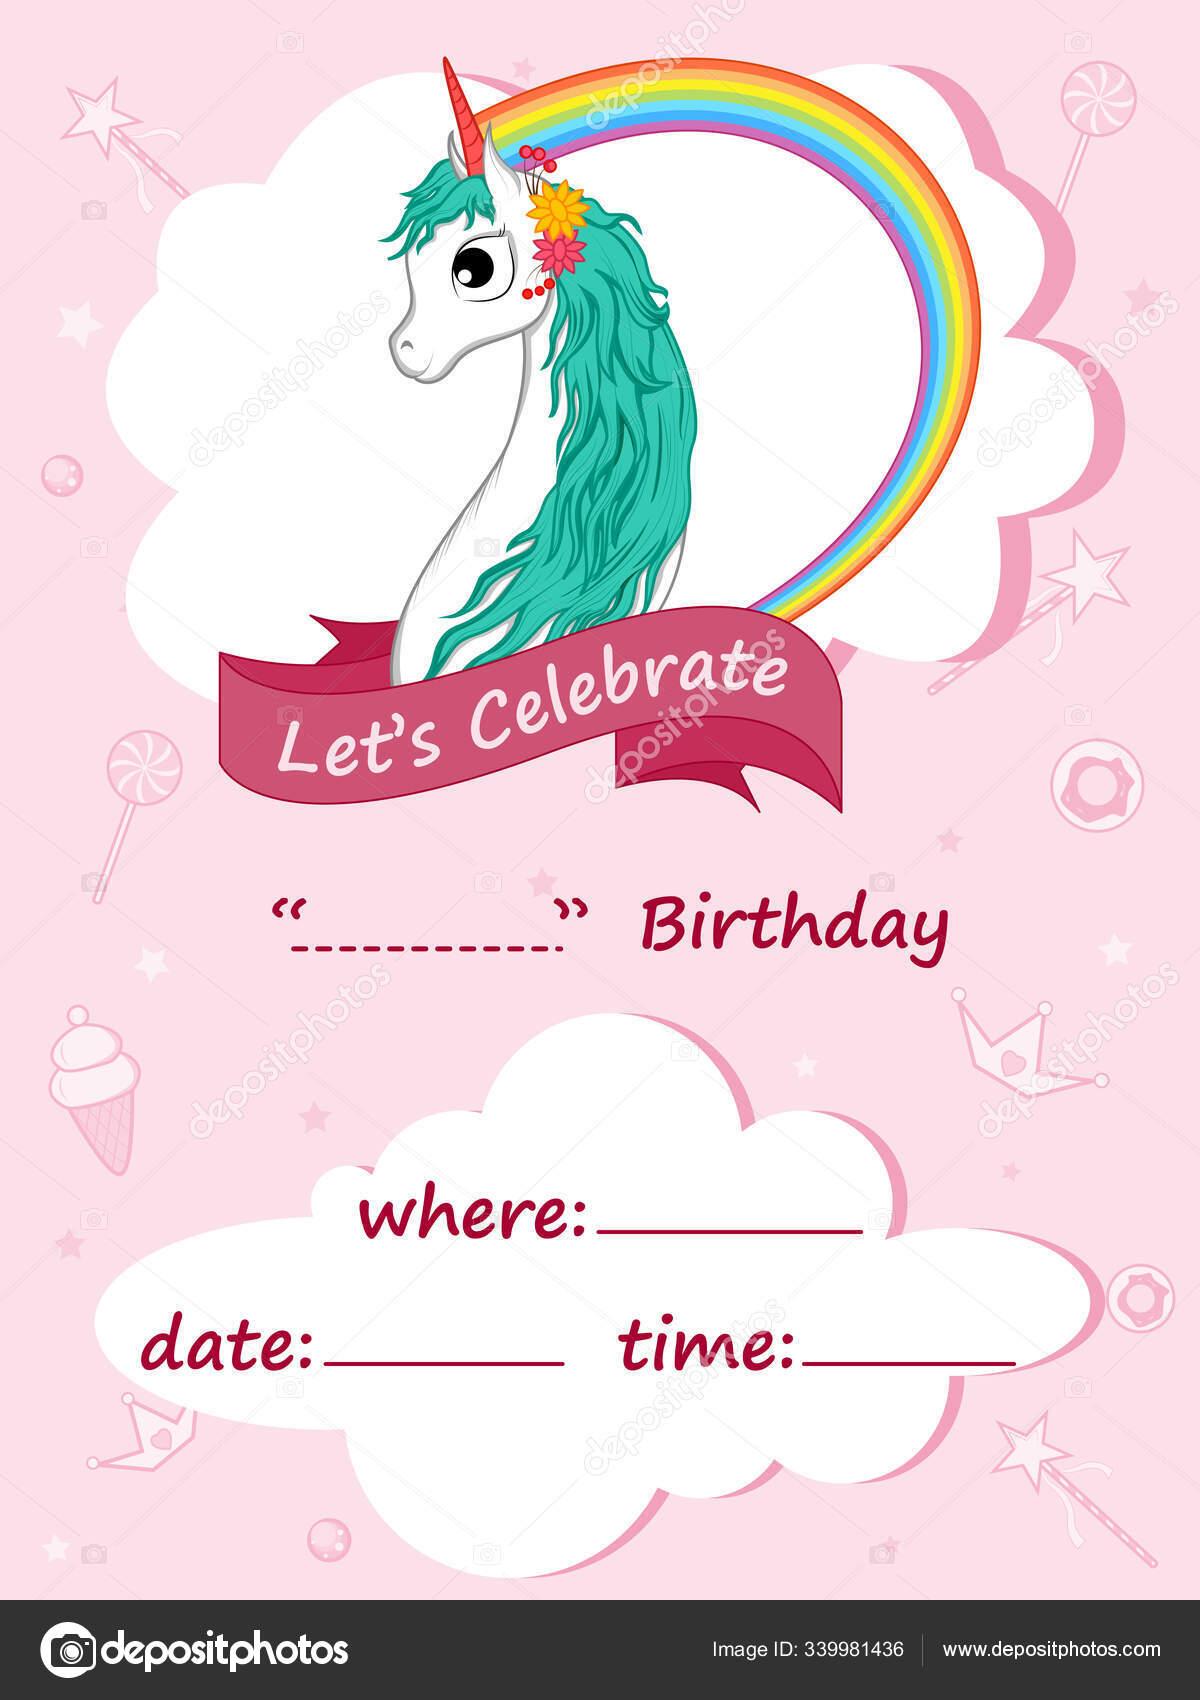 https depositphotos com 339981436 stock illustration vector illustration of colorful trendy html